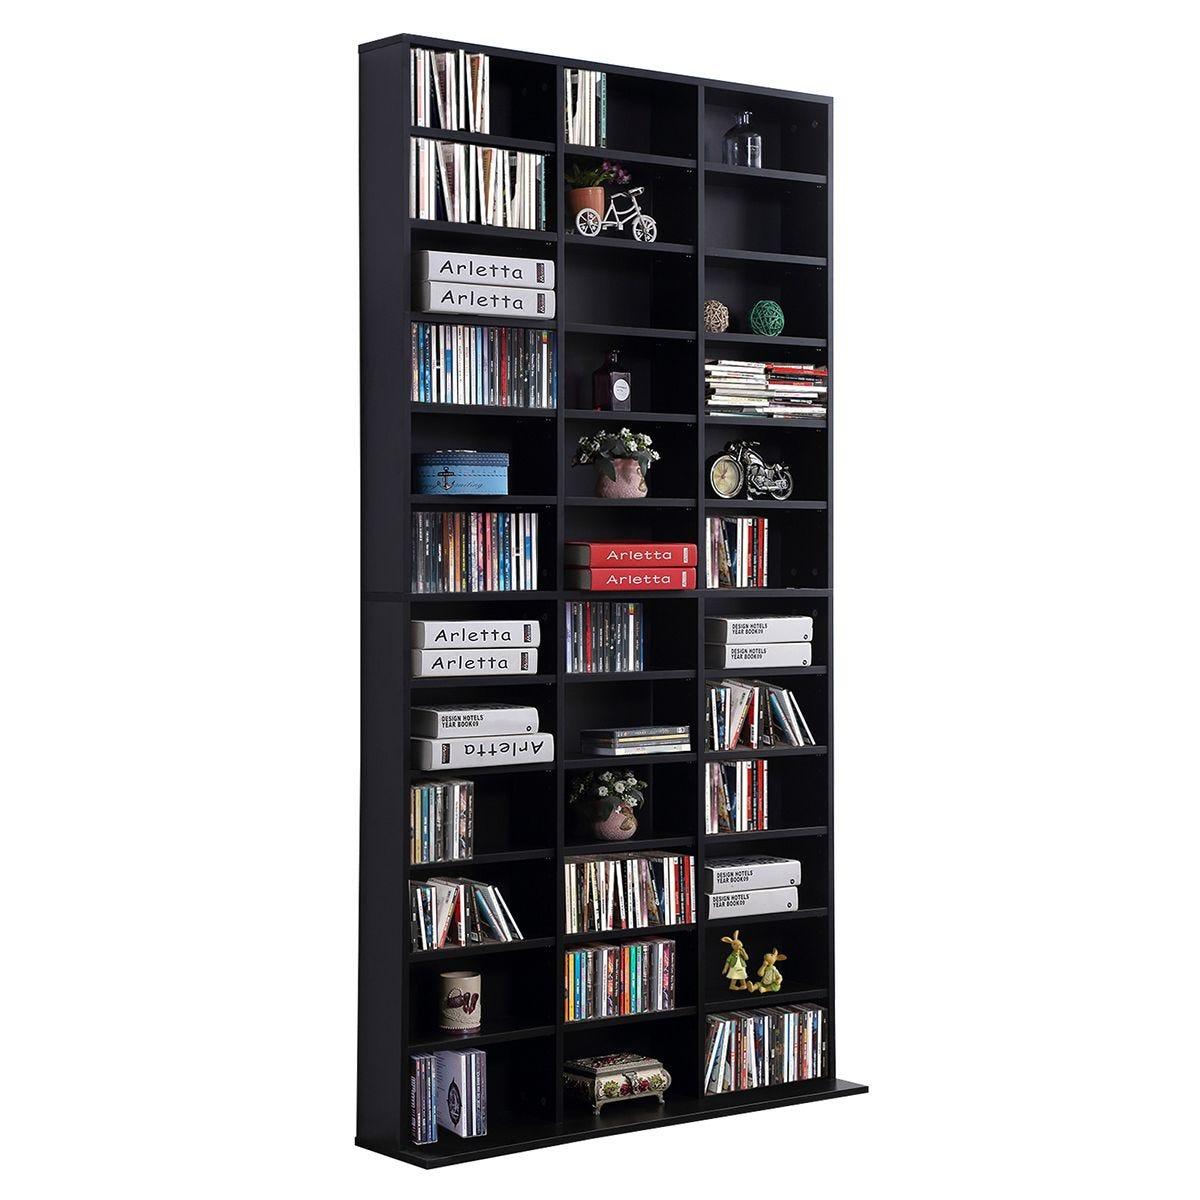 CD DVD Media Storage Display Unit Adjustable Black